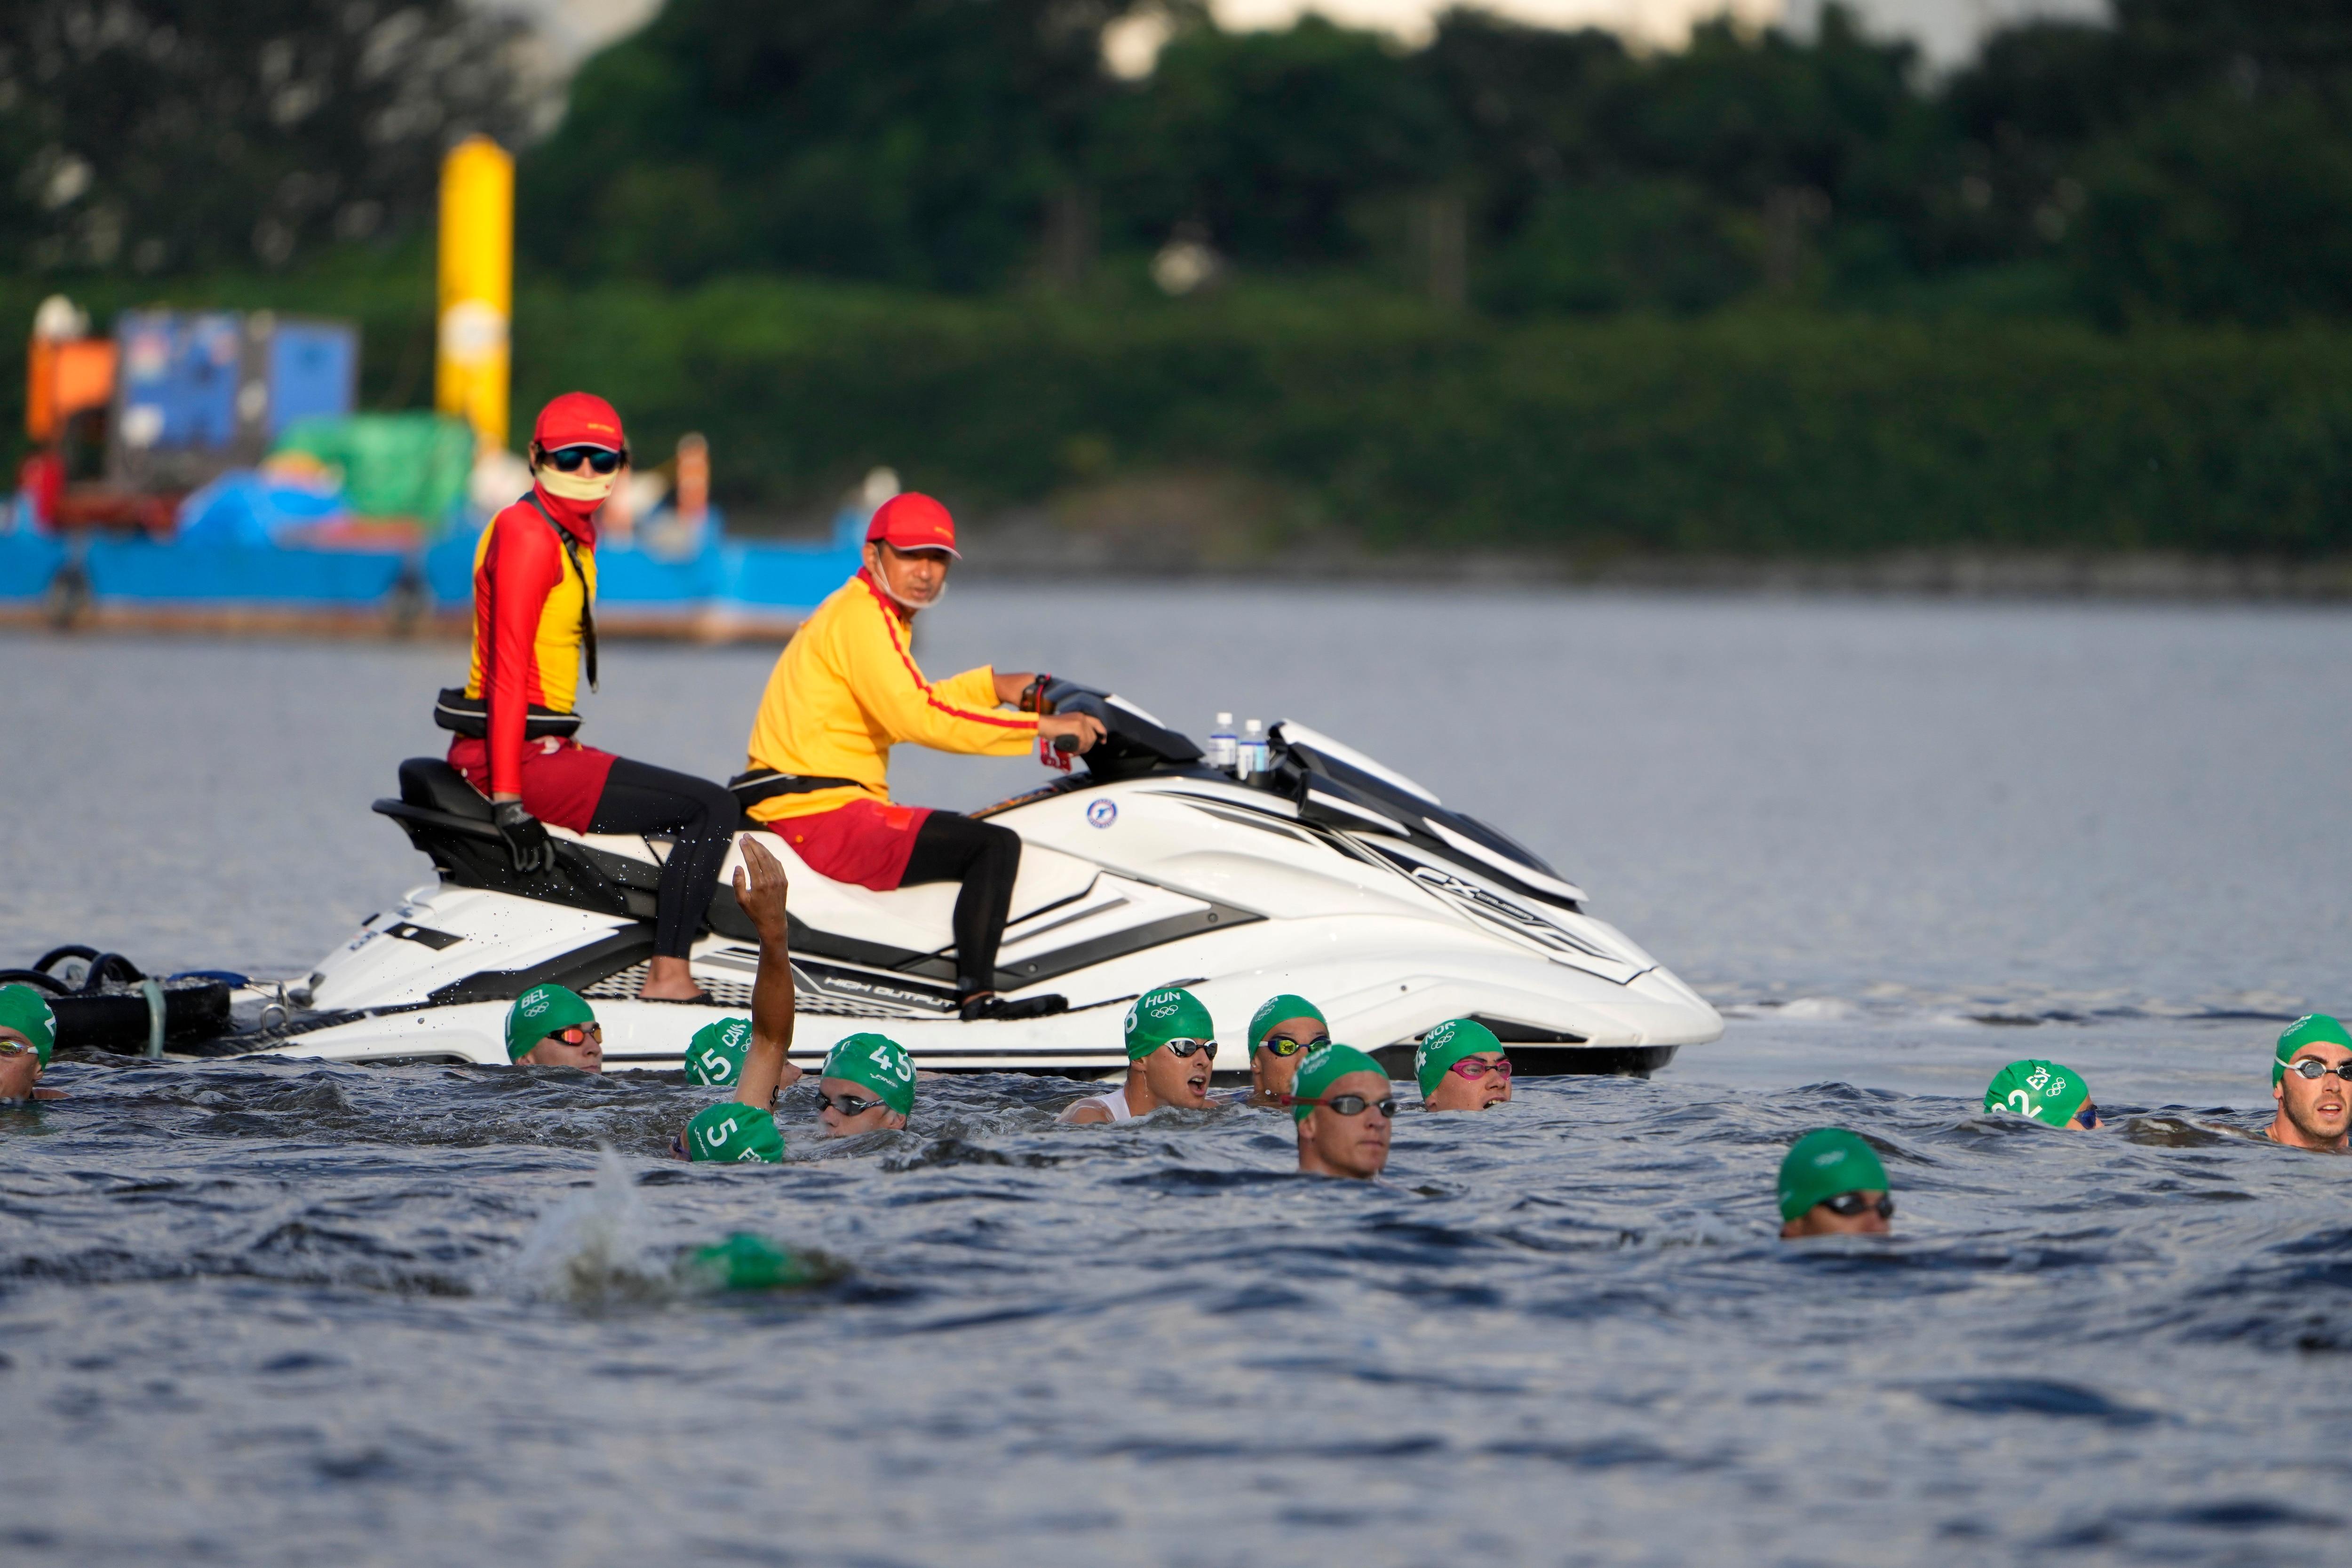 Take 2: Triathlon forced to restart when boat gets in way